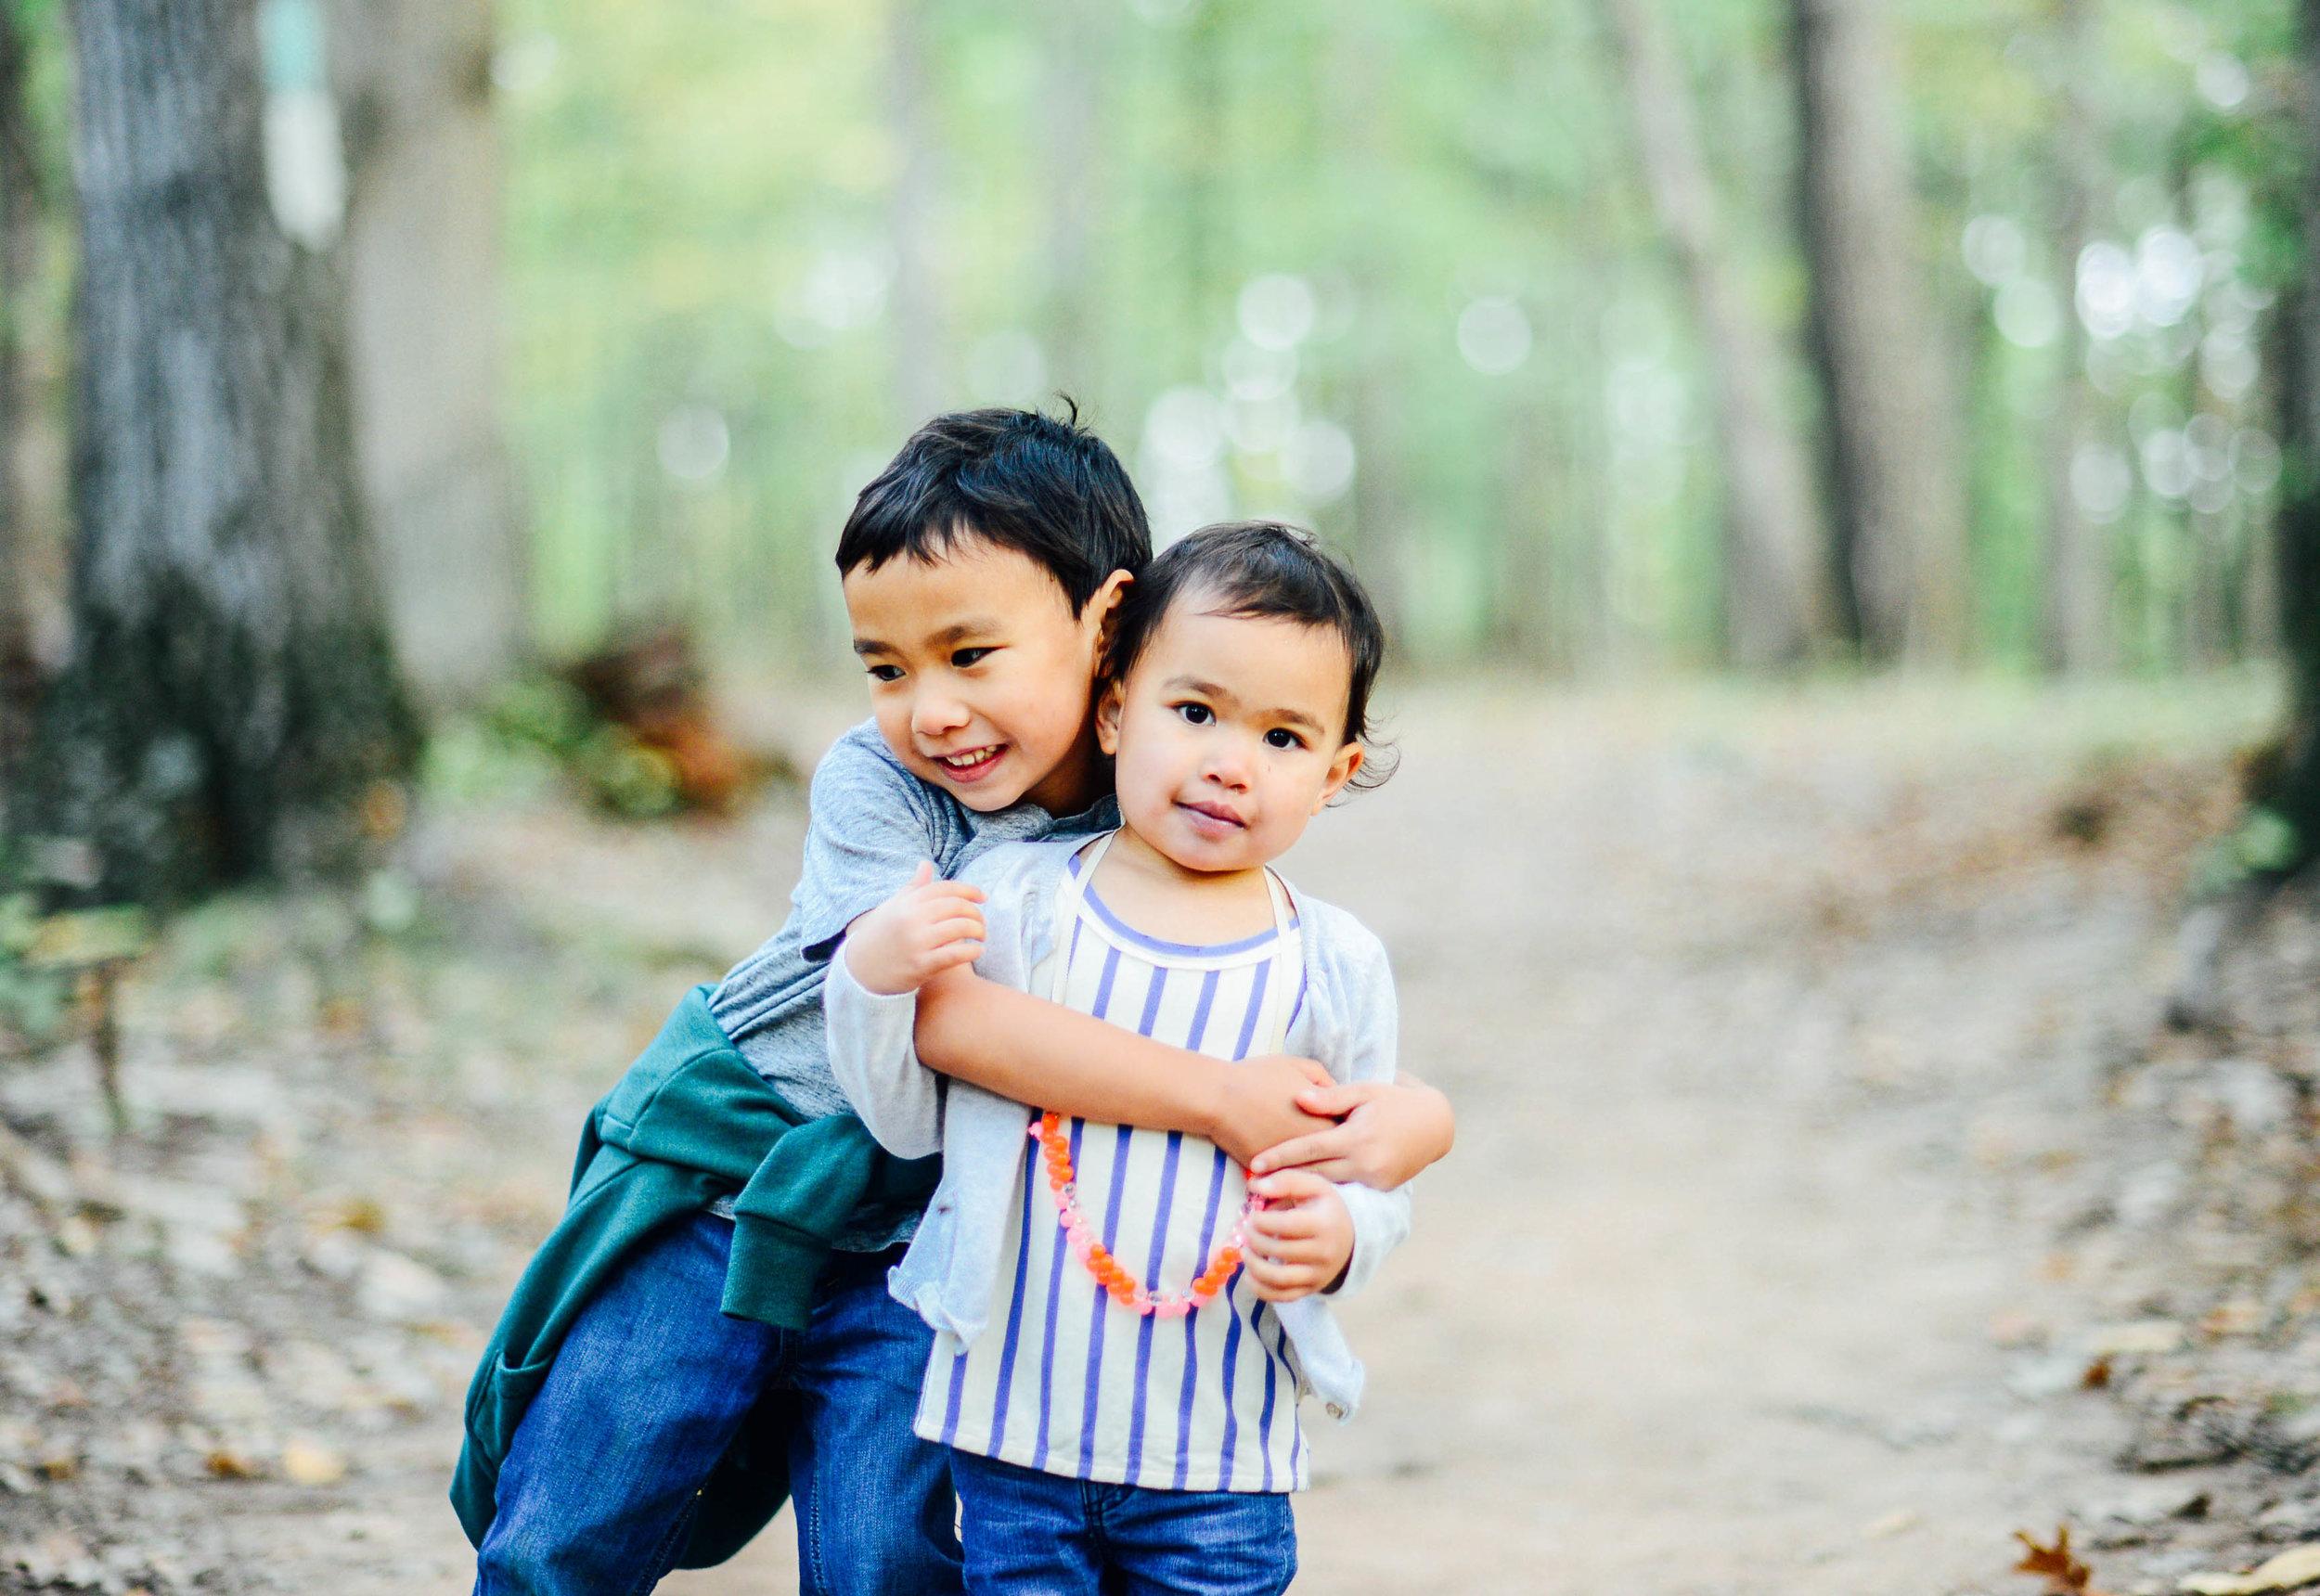 Siblings at Fall Photos at Red Rock Overlook Park Leesburg VA